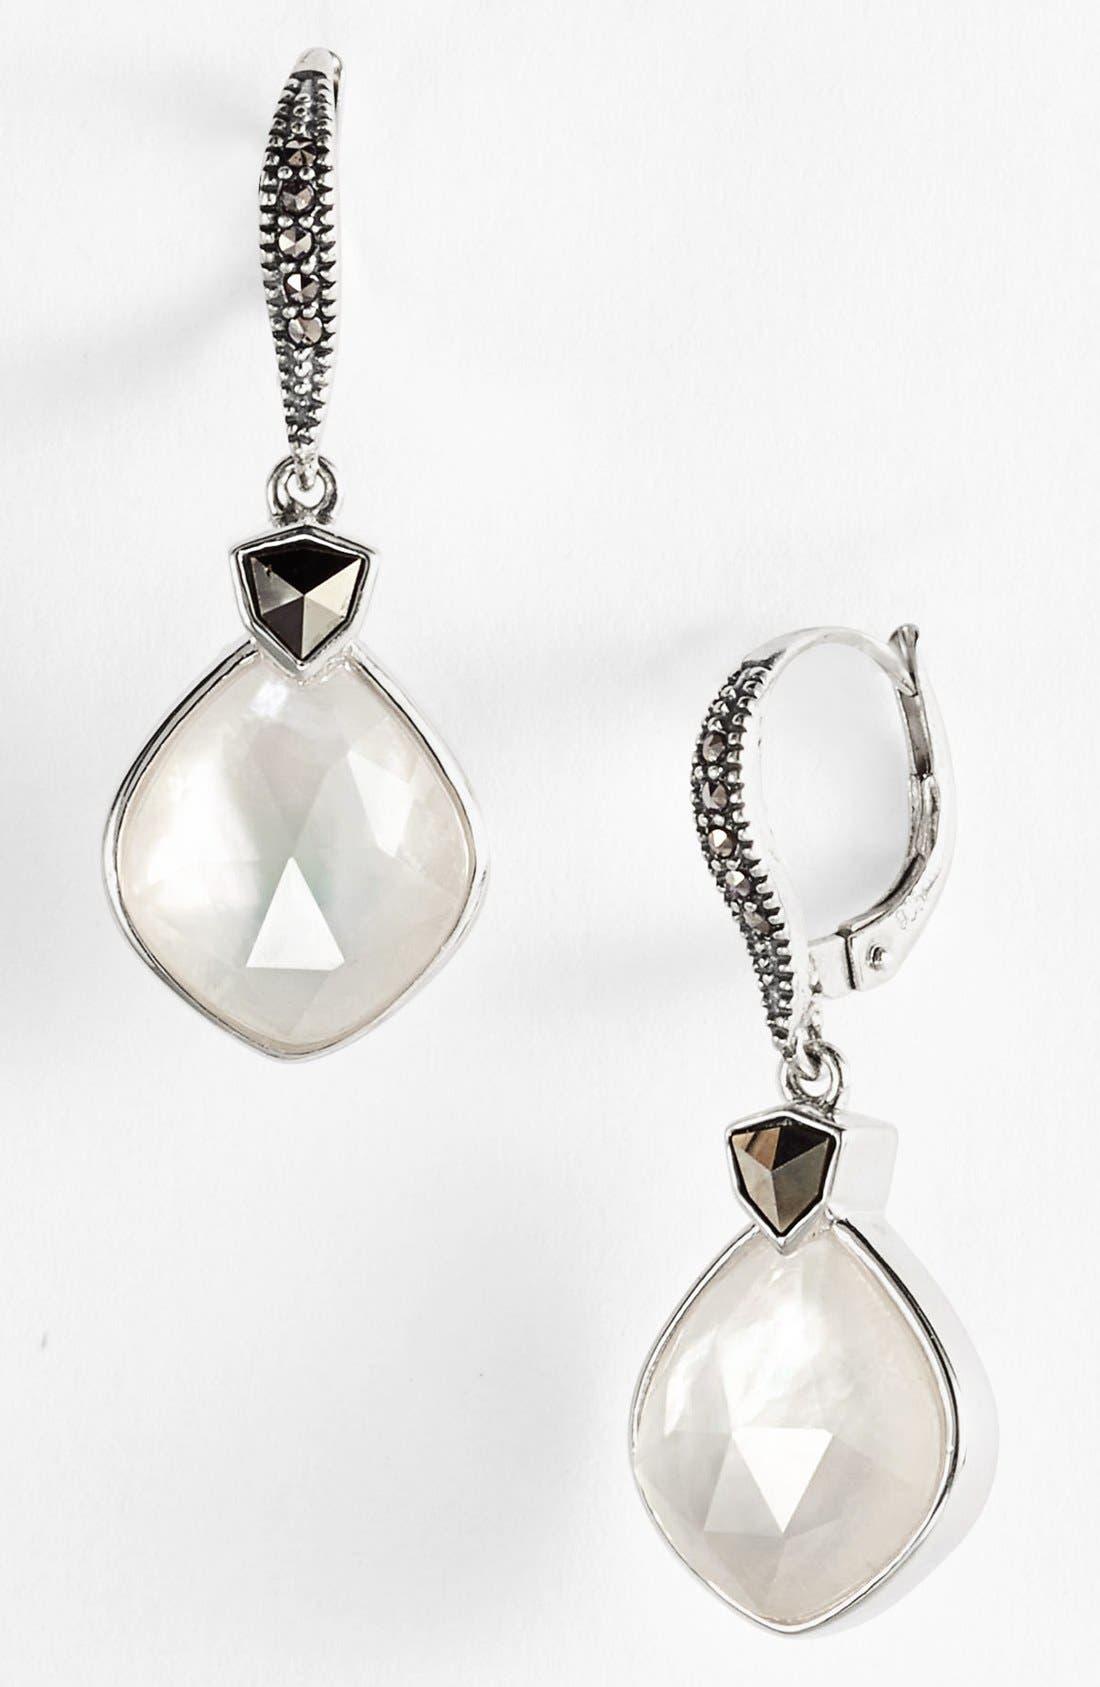 JUDITH JACK 'Pearl Romance' Drop Earrings, Main, color, 040